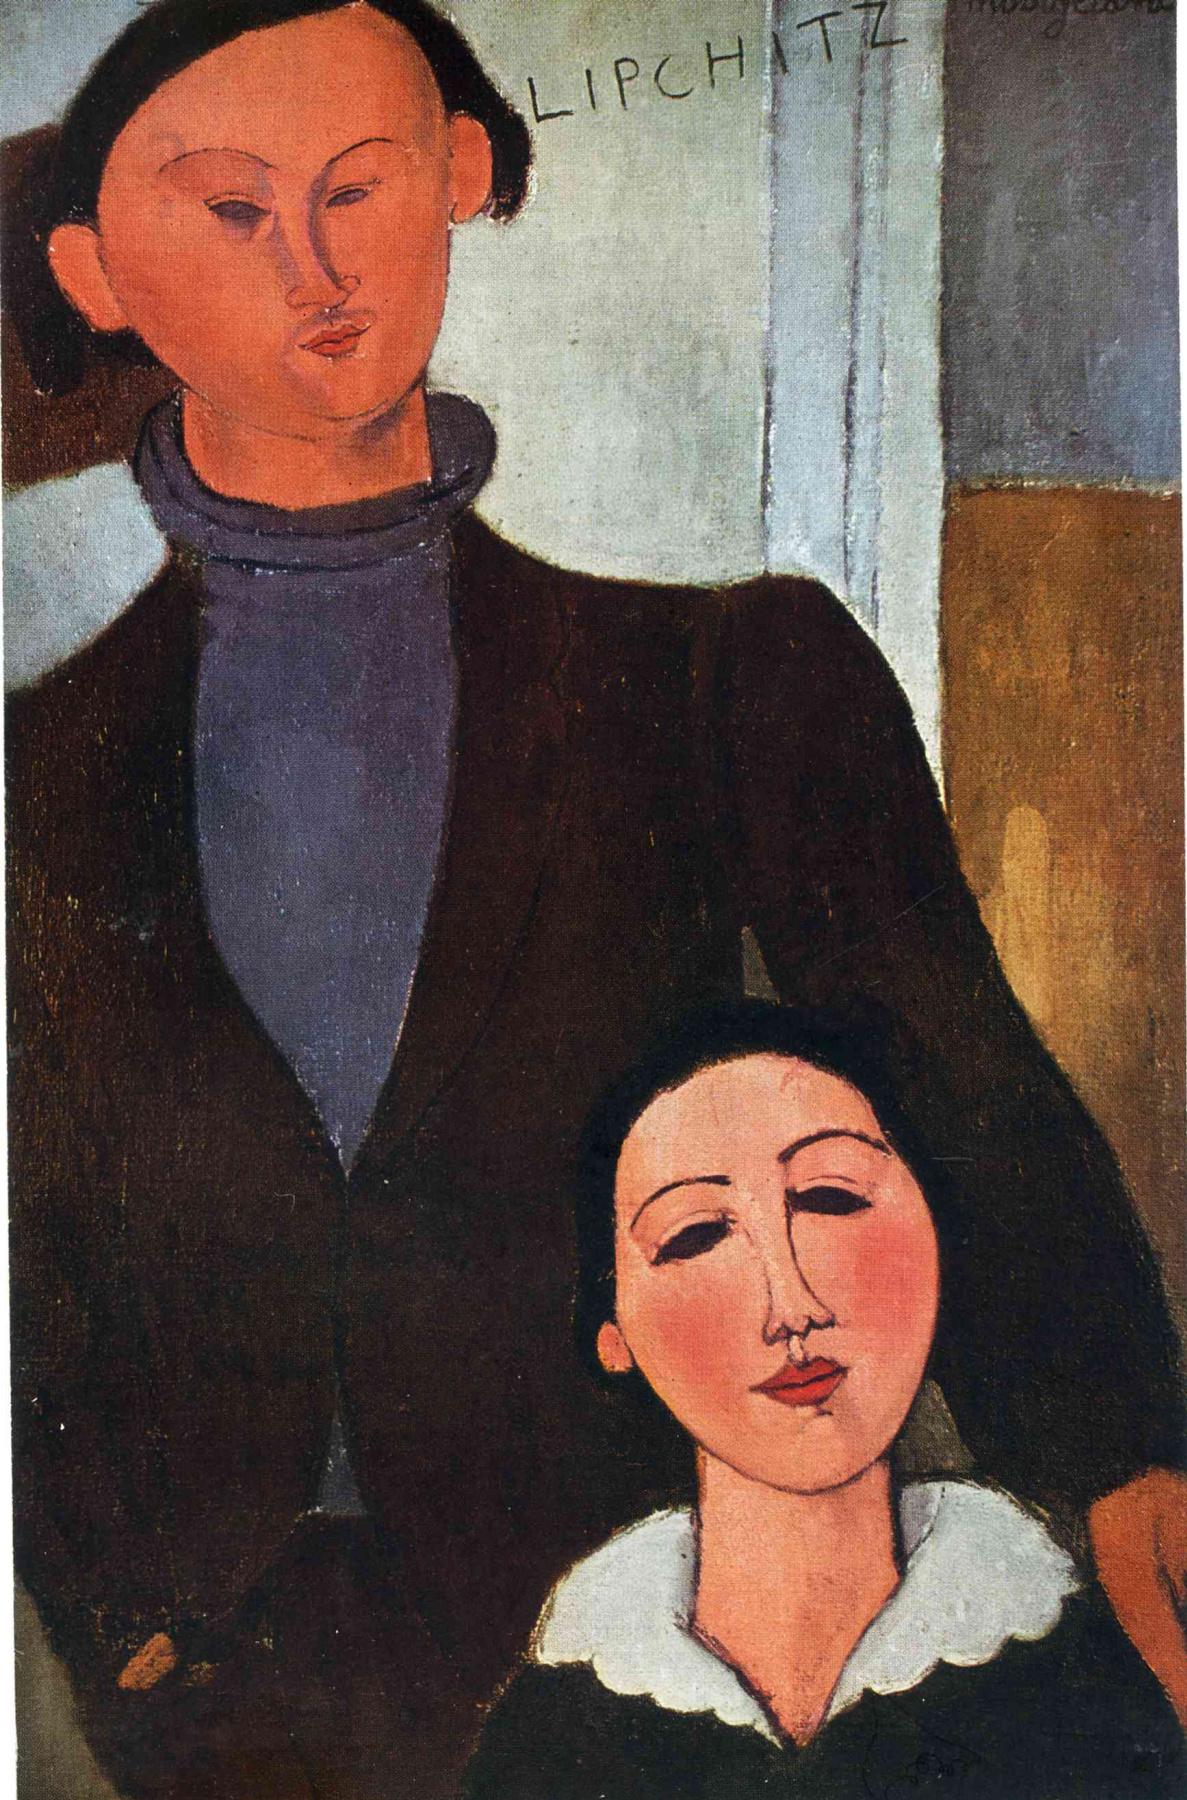 Amedeo Modigliani. Portrait of Jacques and Bertha Lipchitz